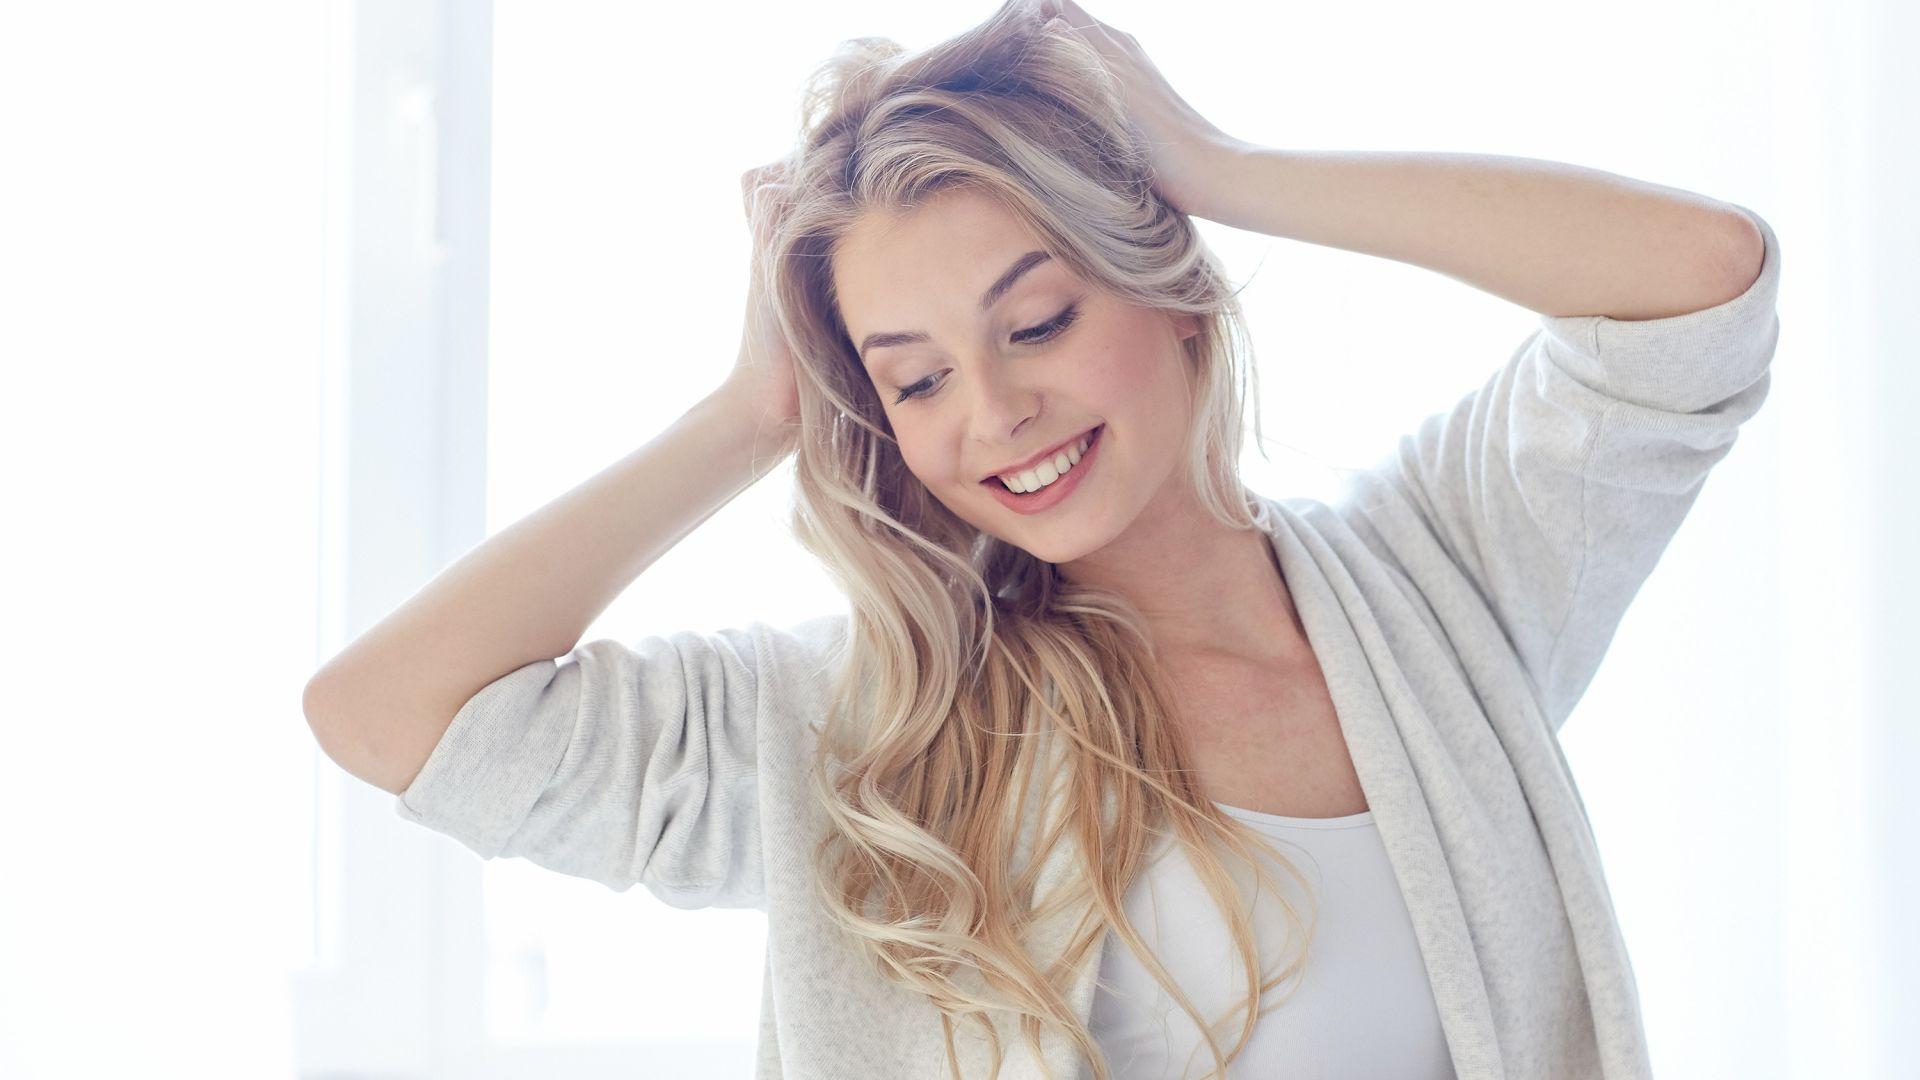 Desktop wallpaper happy mood girl model blonde hd image picture background 19342b - Happy mood wallpaper ...